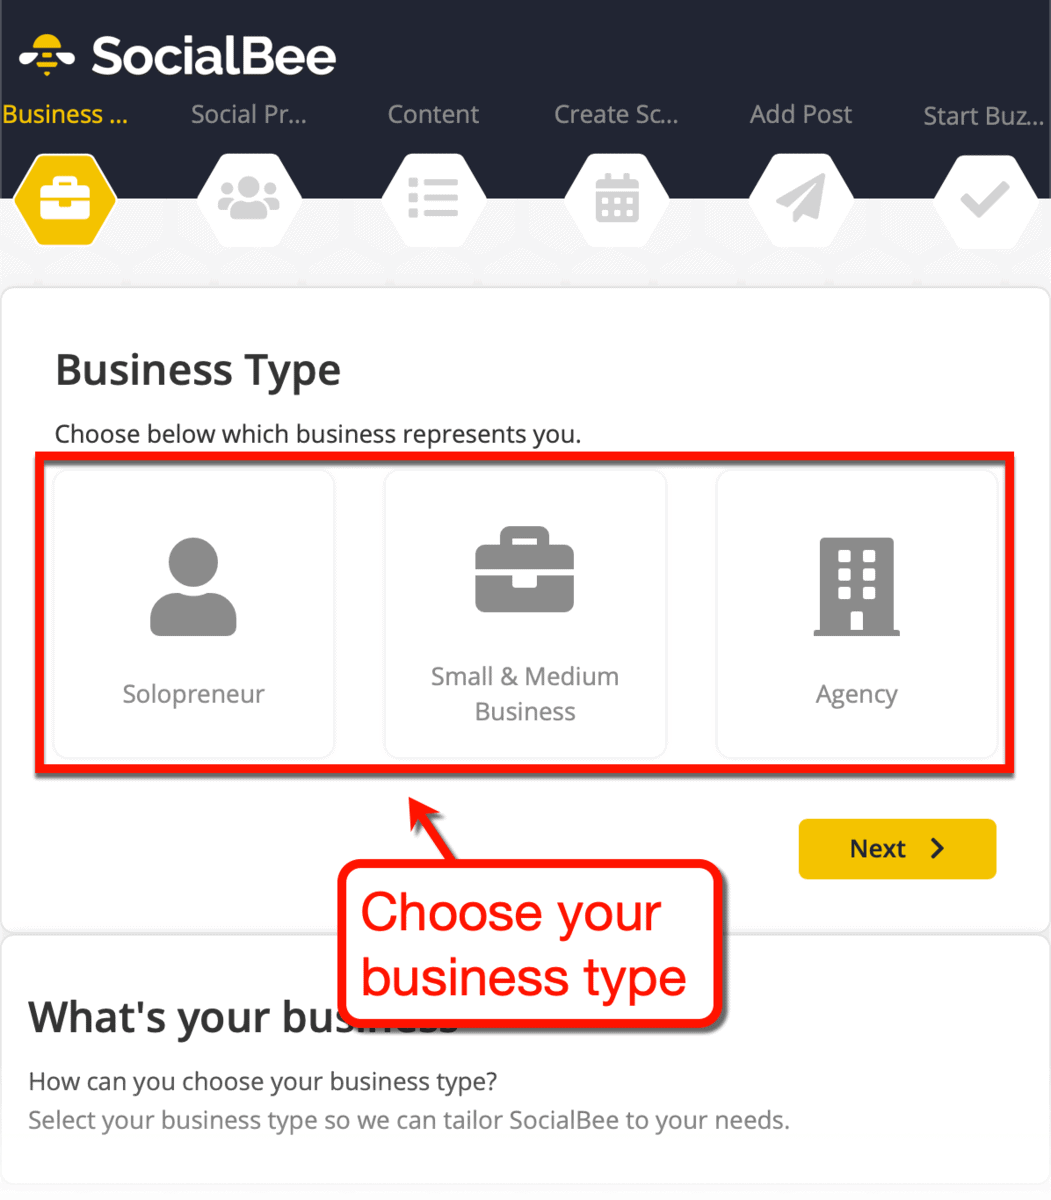 SocialBee Business Type